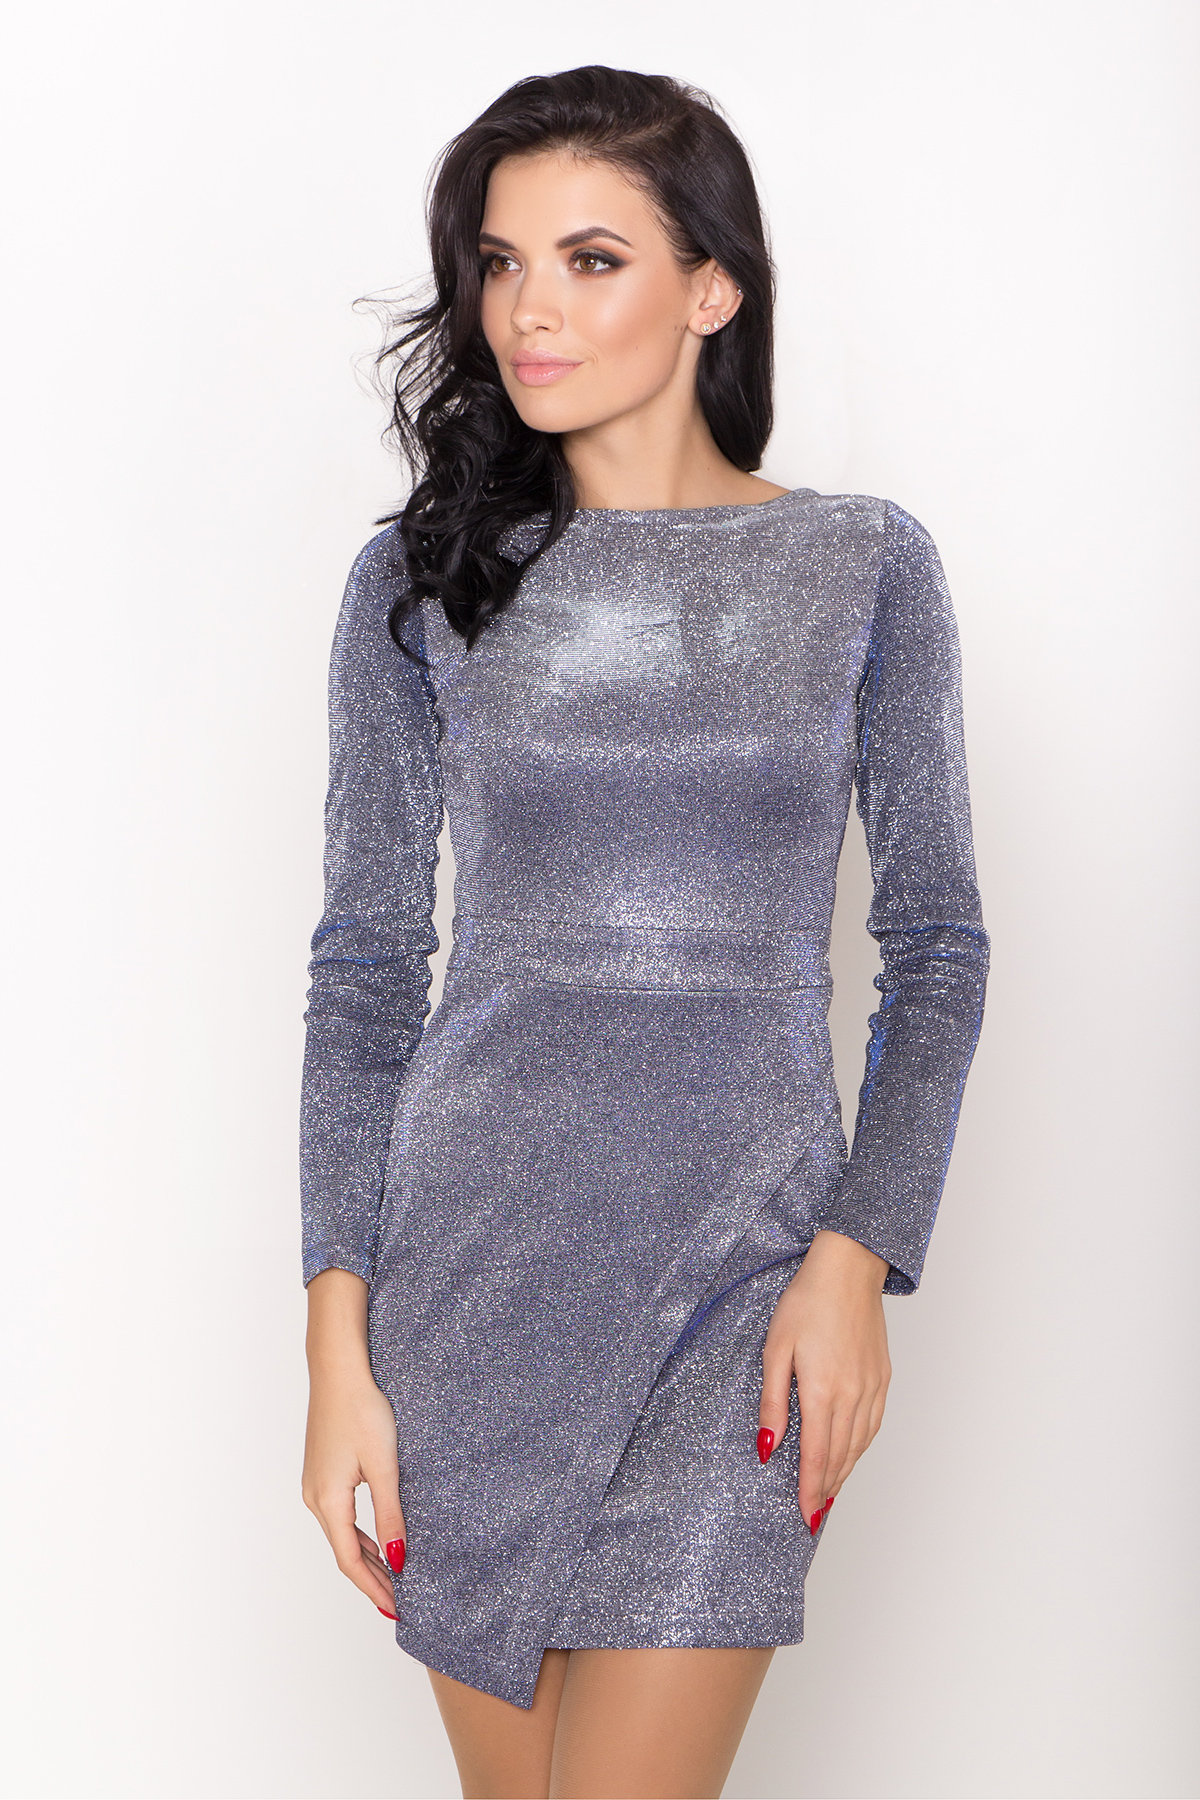 Коктейльное платье Кристал 8346 АРТ. 44717 Цвет: Серебро/электрик - фото 3, интернет магазин tm-modus.ru